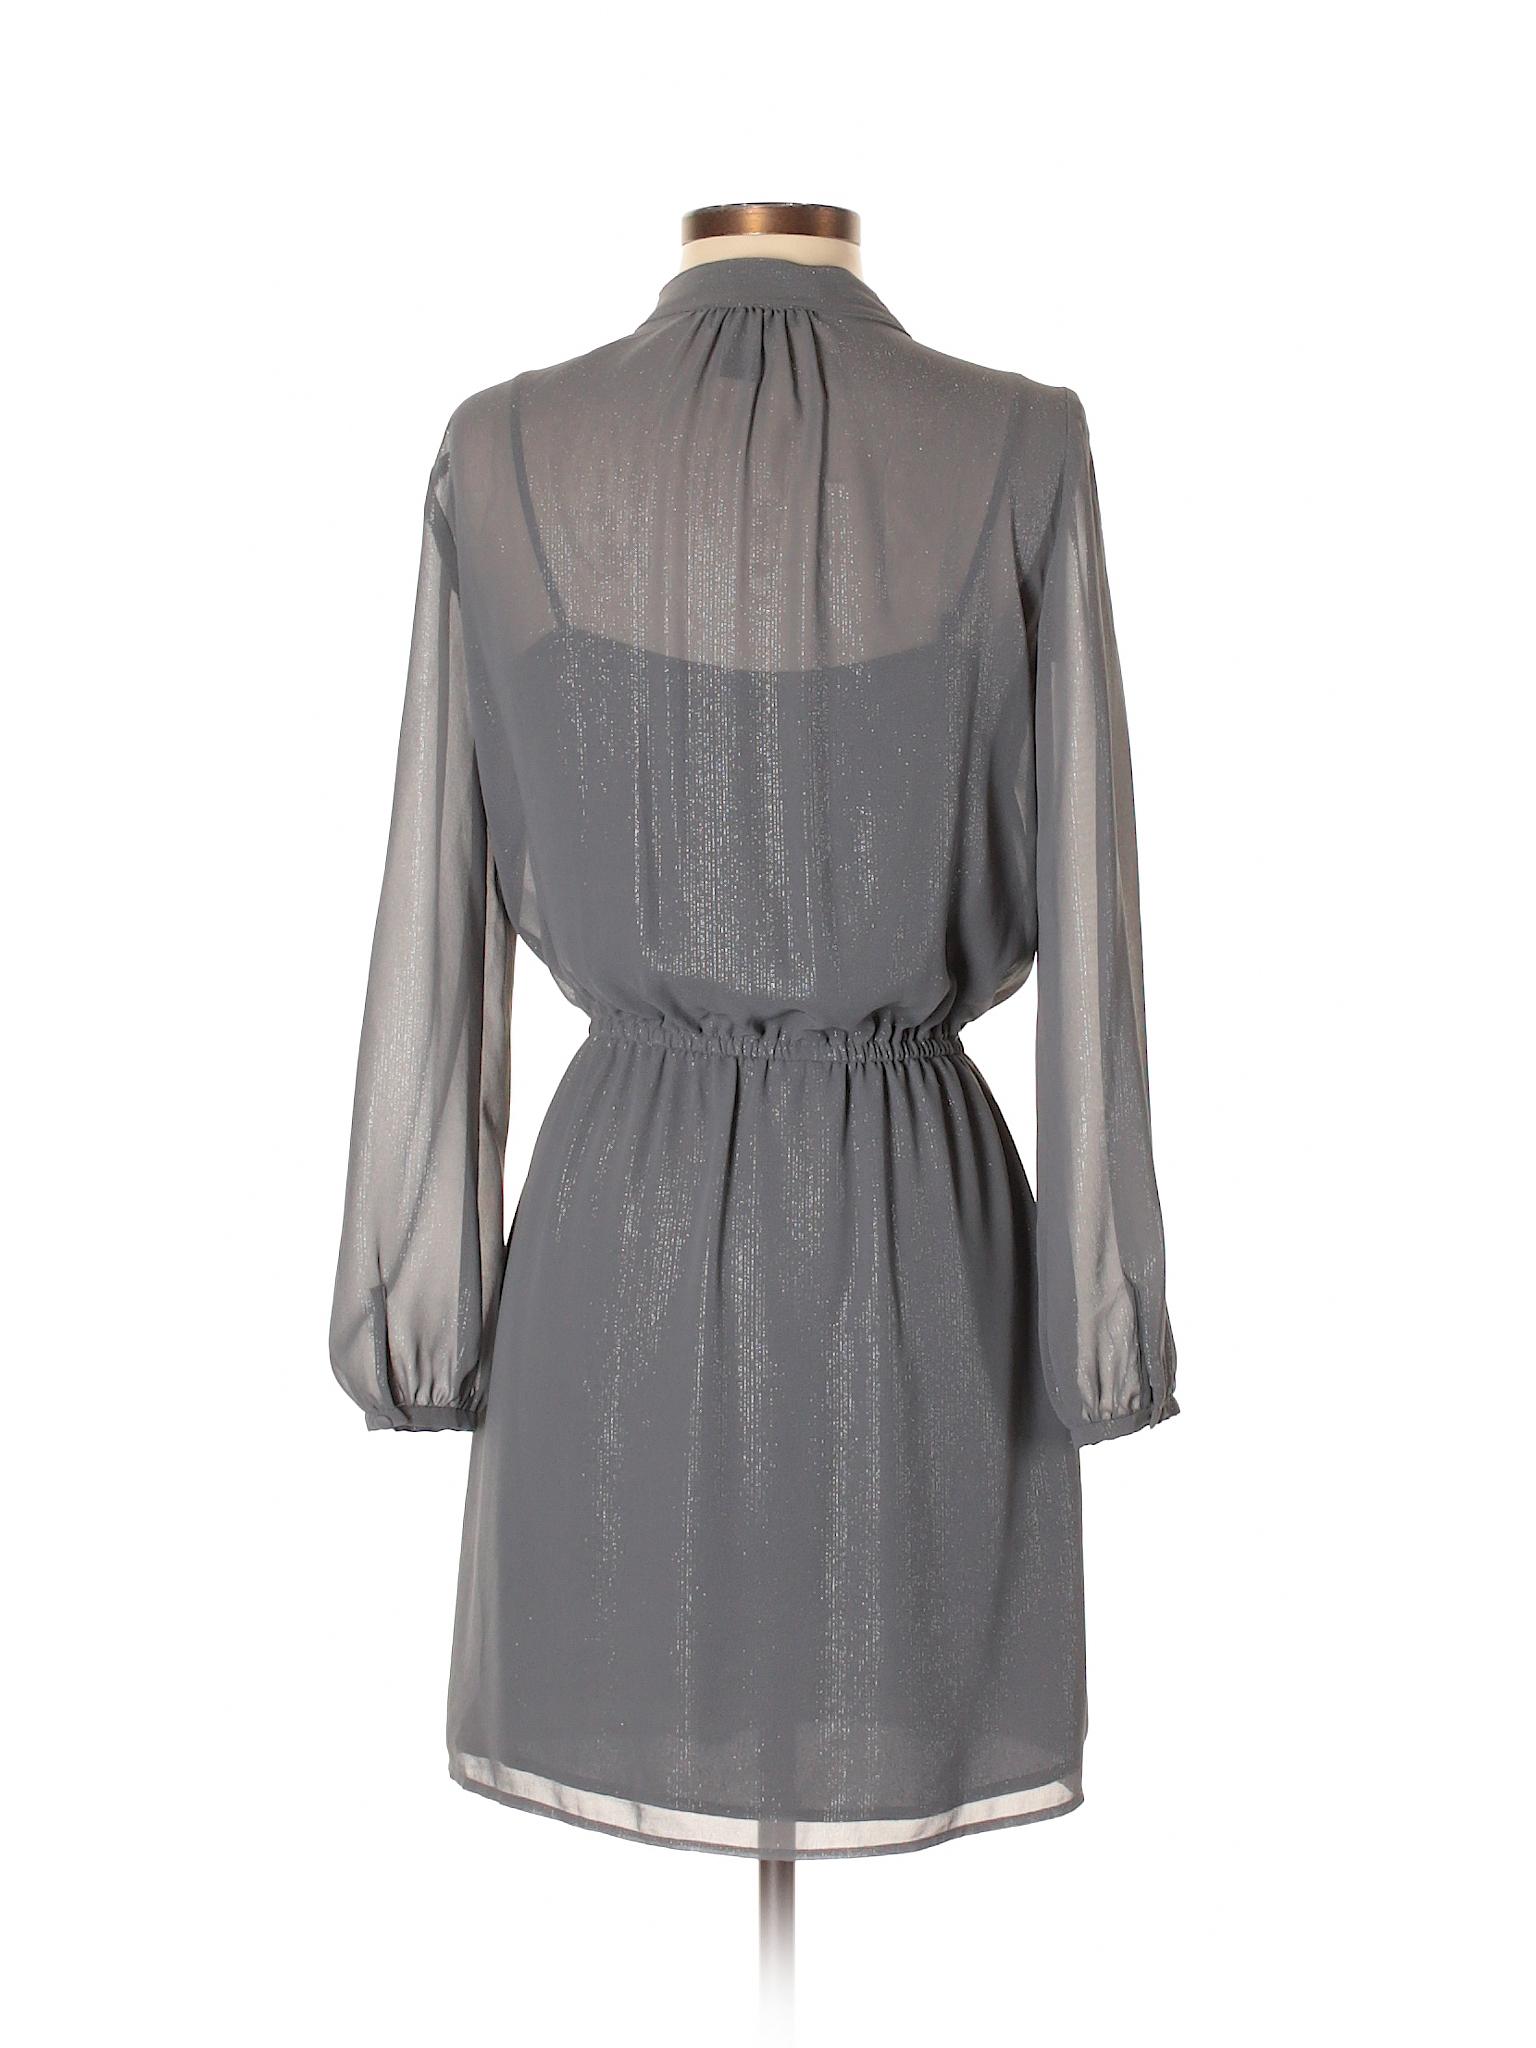 Boutique Casual winter House Dress White Market Black rwrgfFXq